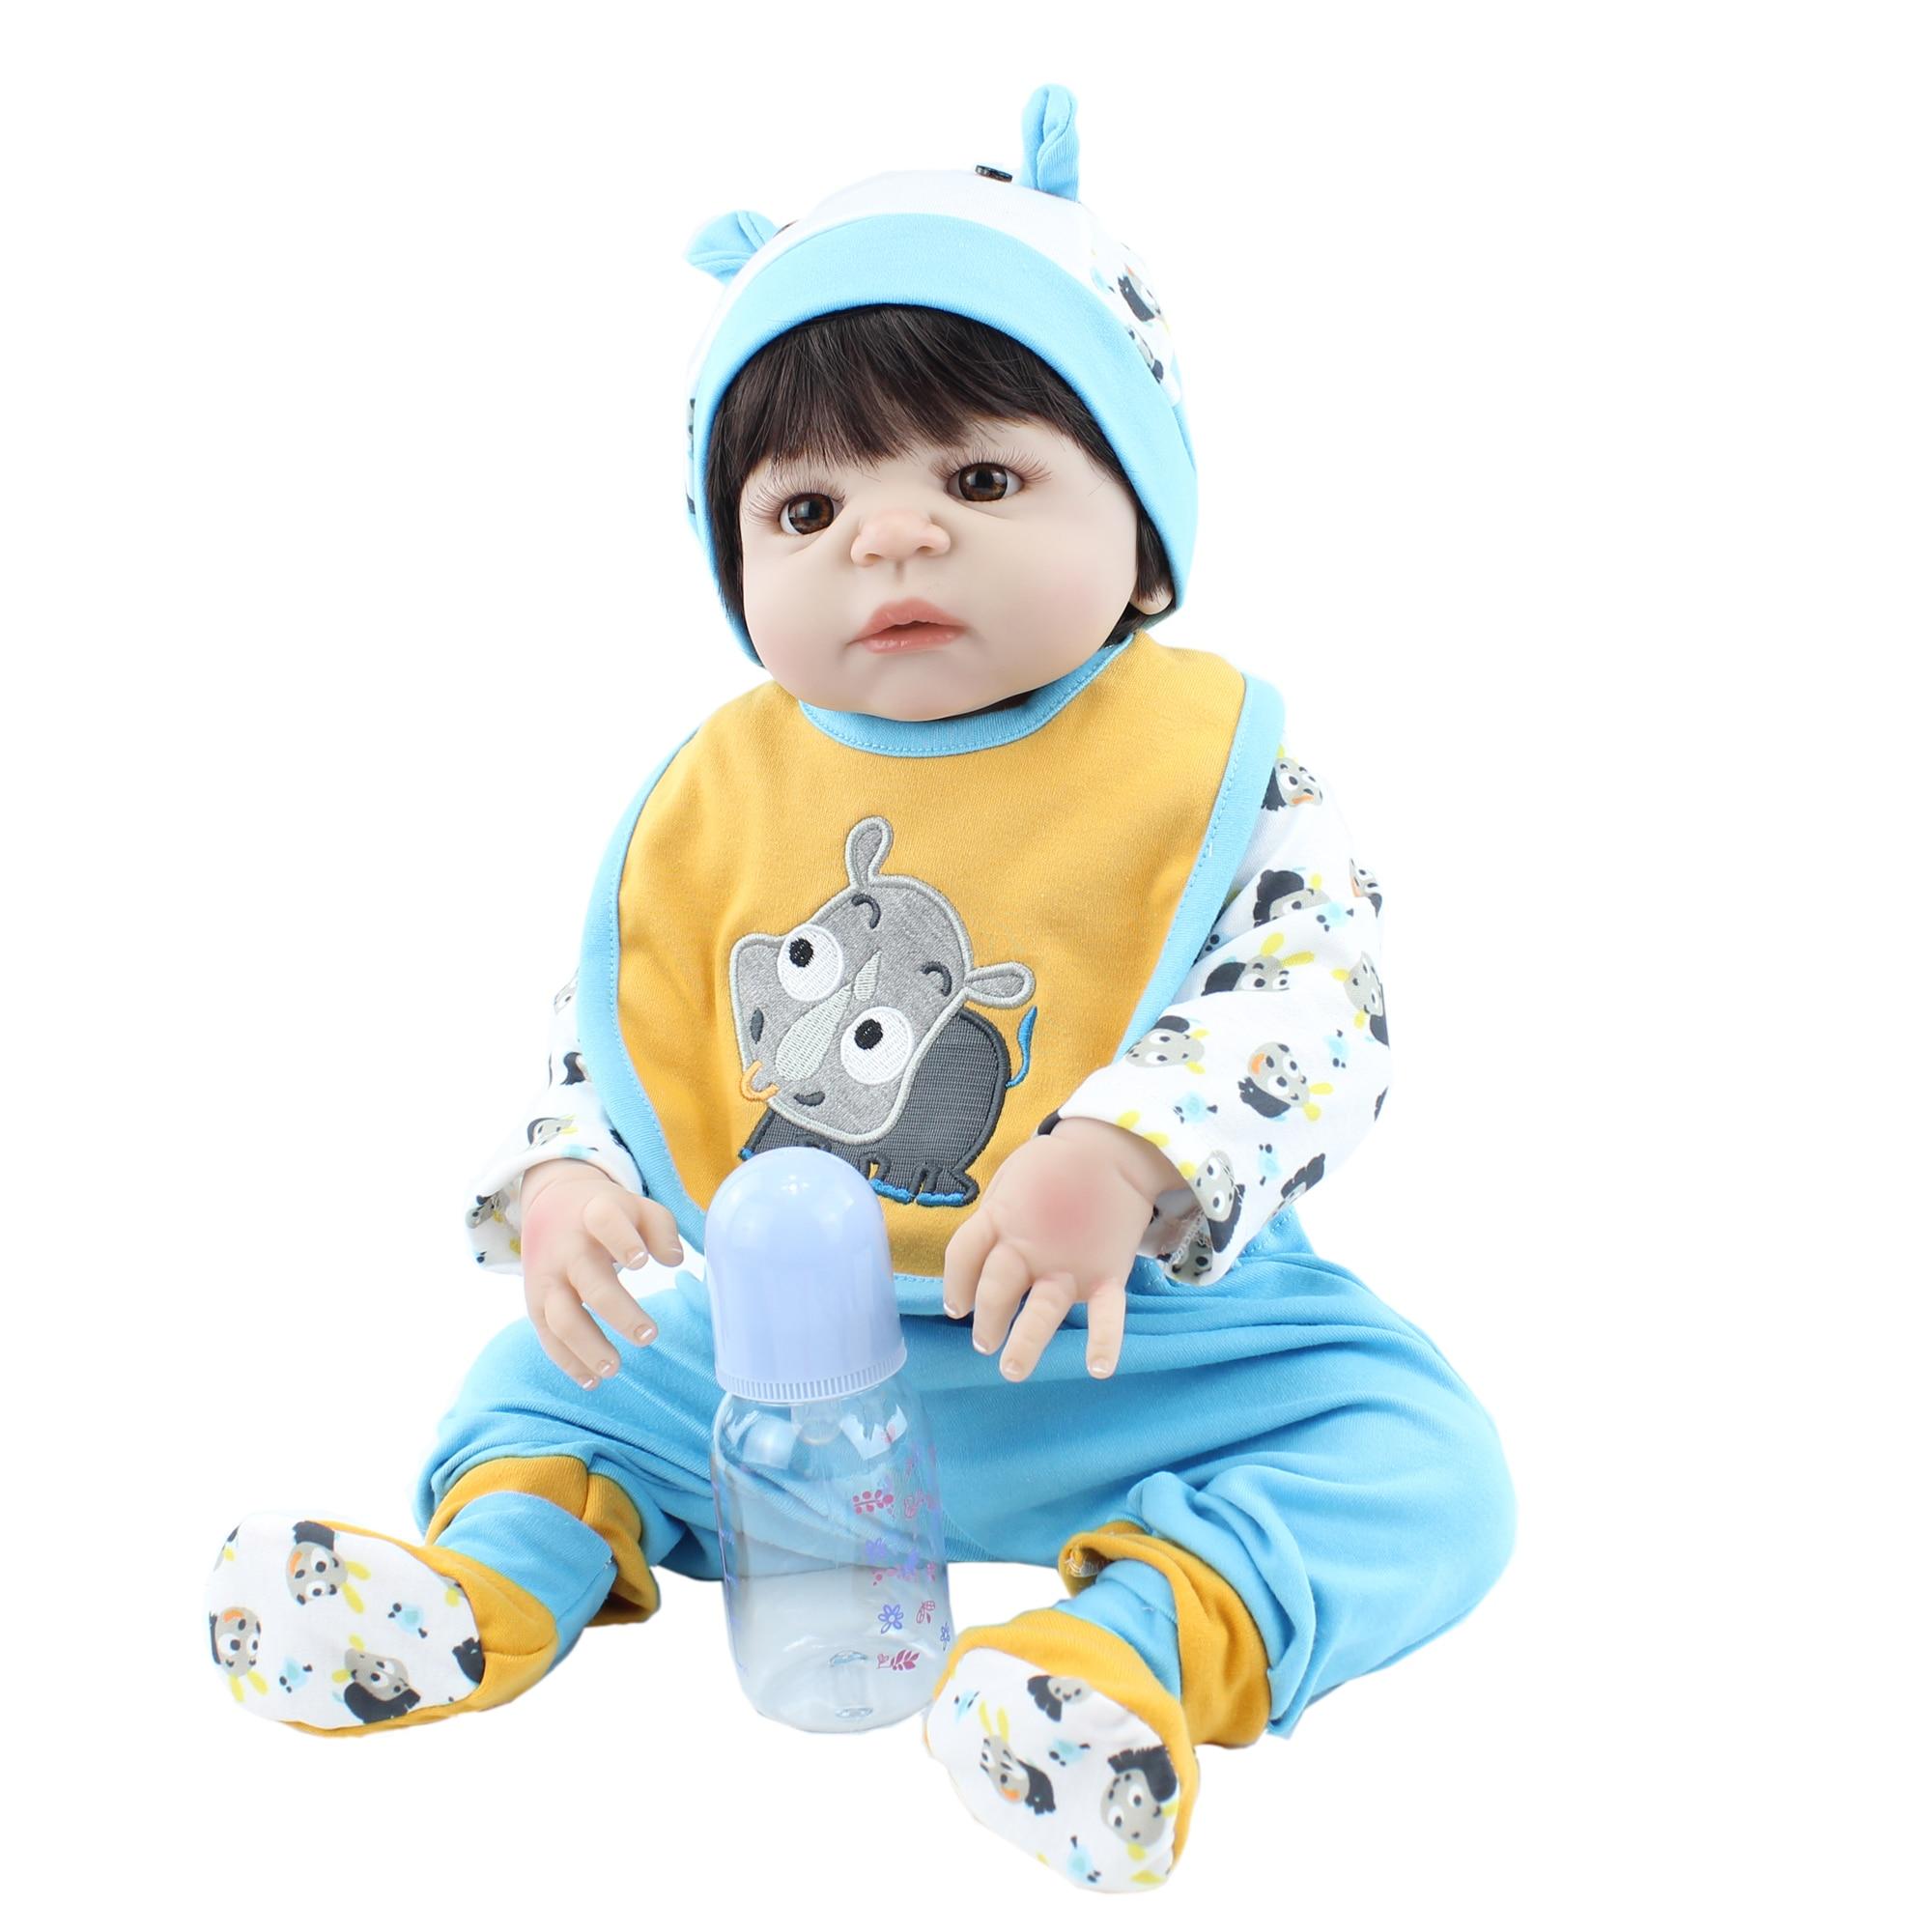 55CM Soft Silicone Body Reborn Baby Boy Doll Toy For Girl Lifelike Vinyl Newborn Alive Babies